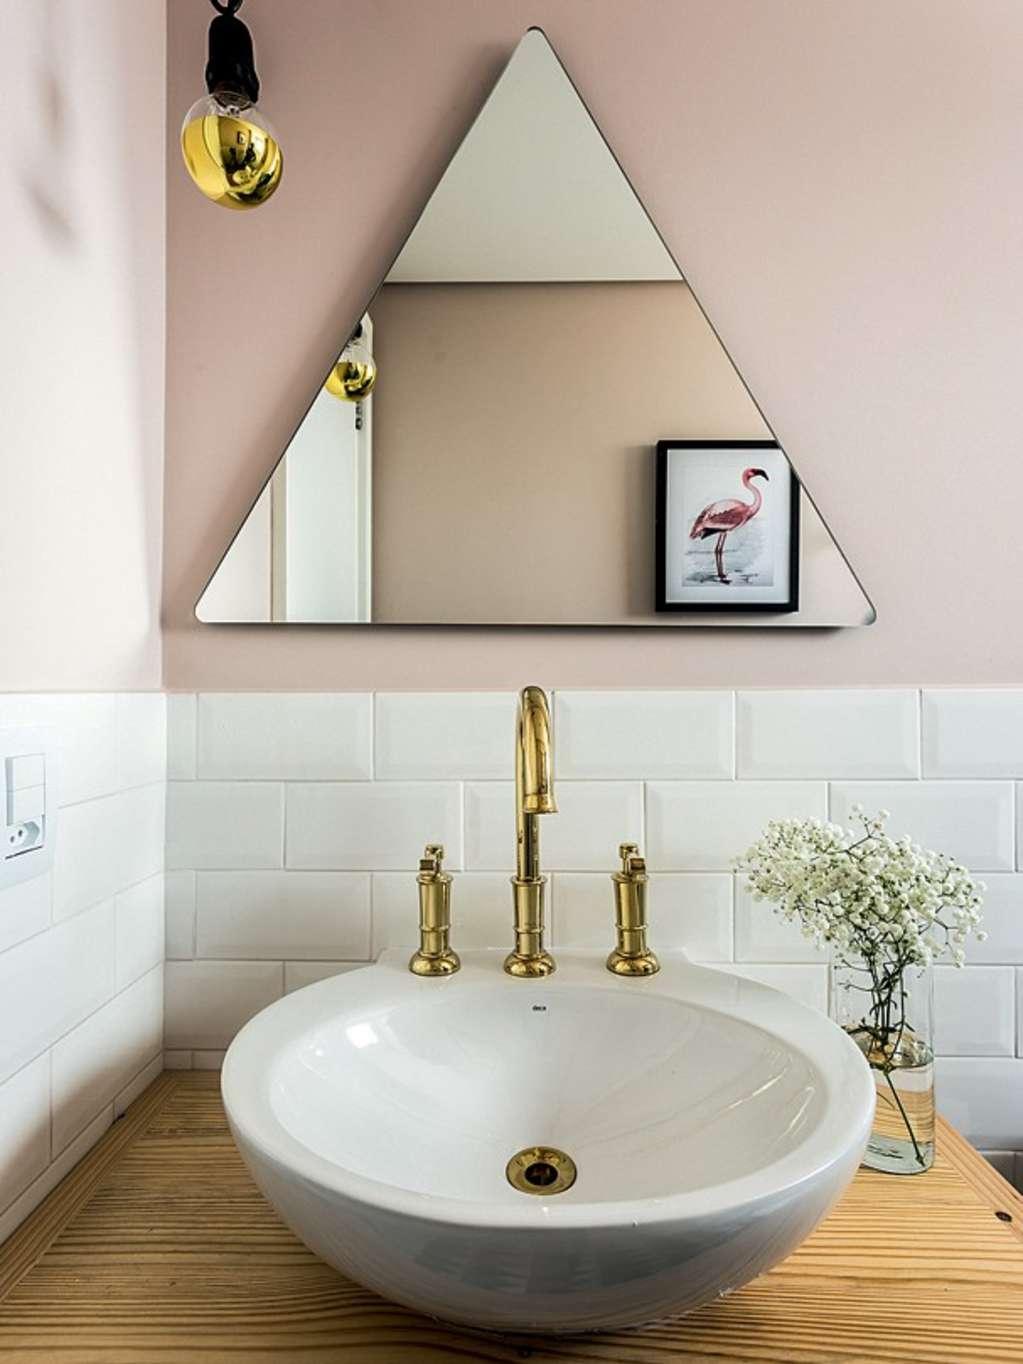 2017 Trend Watch: The Best Bathroom Paint Colors